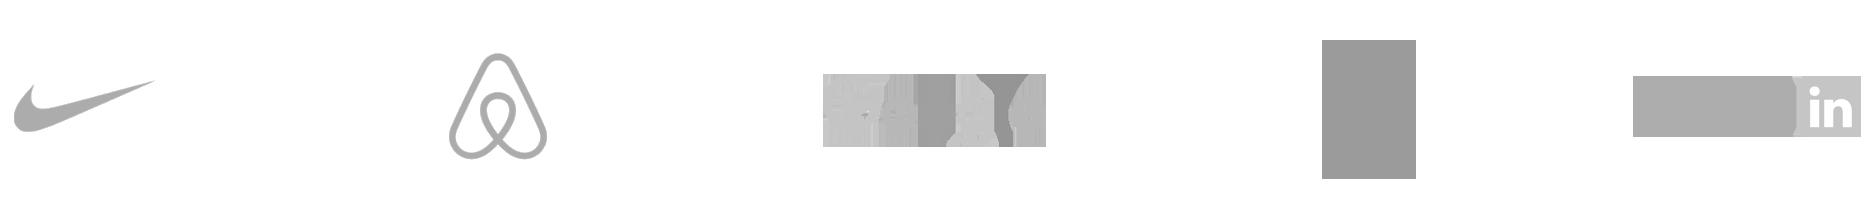 Wrght Logo banner 1.png